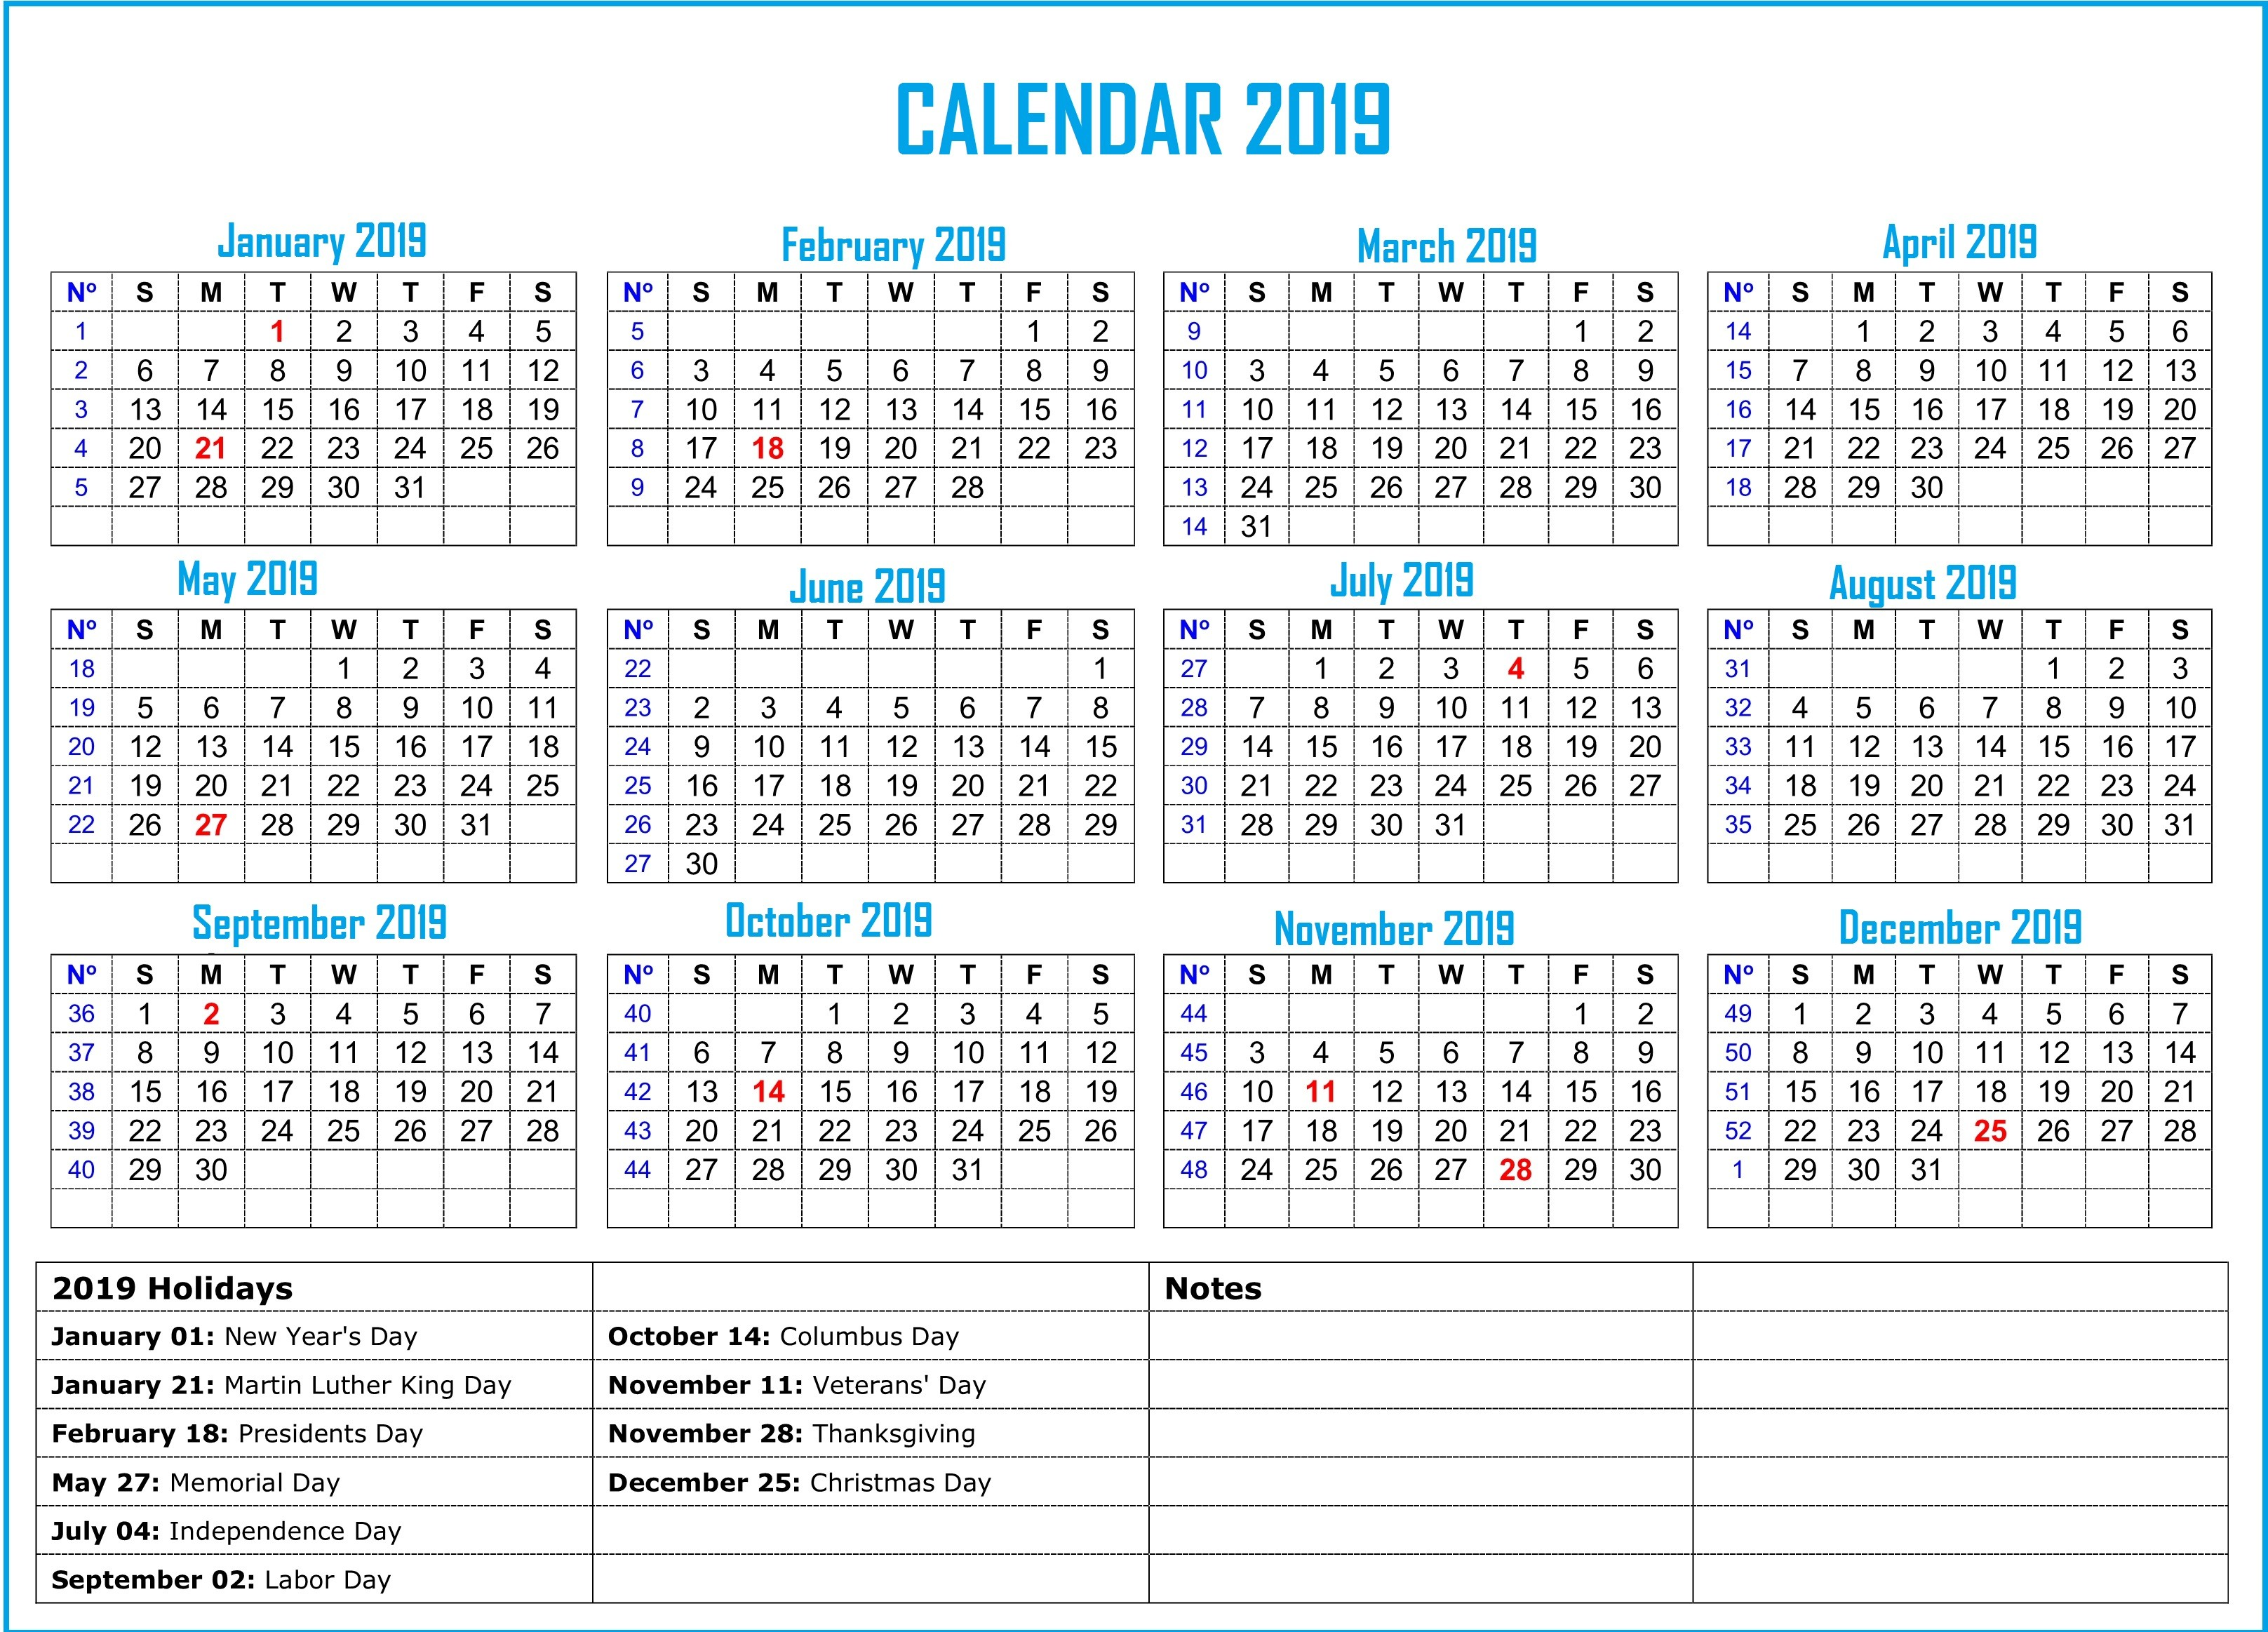 2019 Calendars with Holidays Printable 2019 Calendar with Holidays